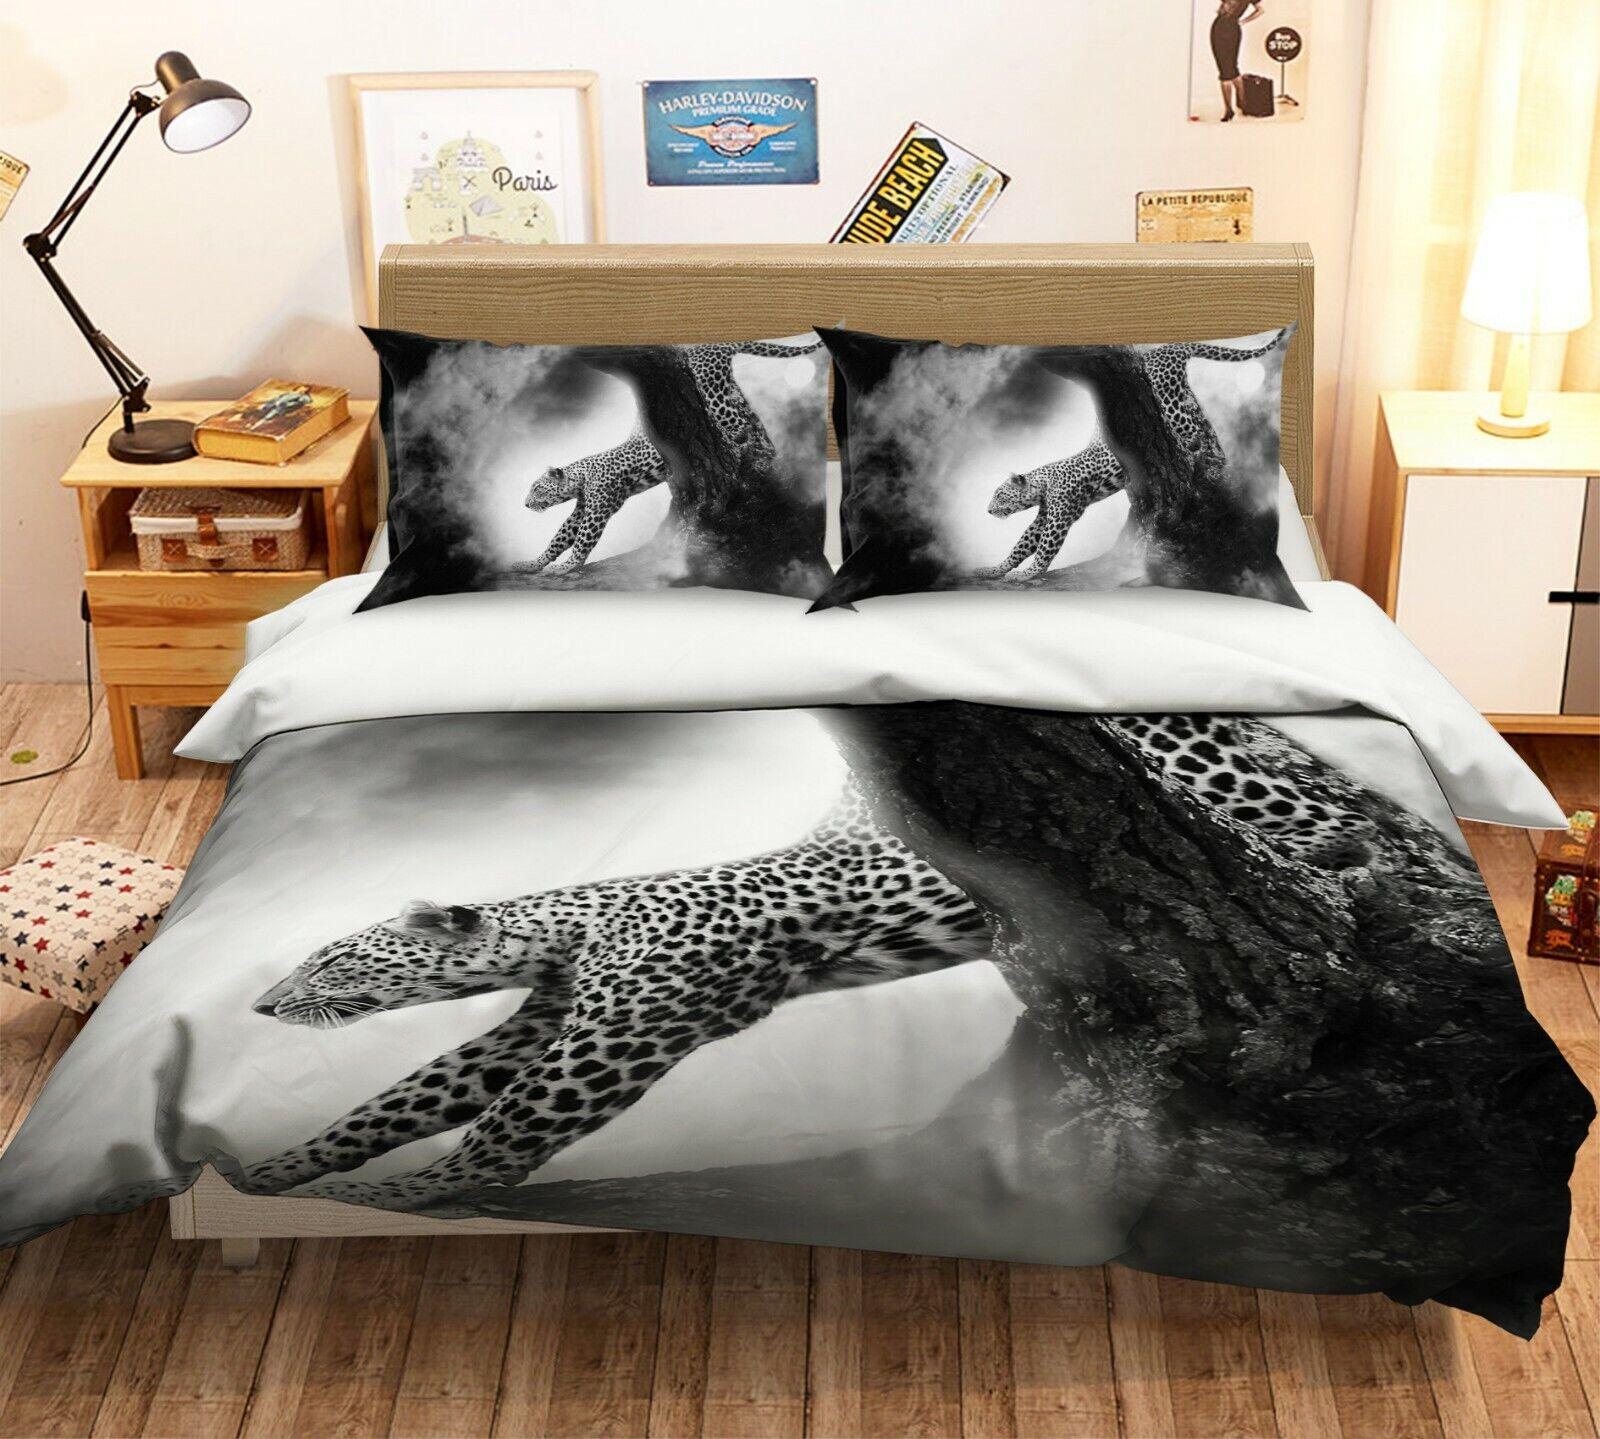 3D Leopard G71 Animal Bed Pillowcases Quilt Duvet Cover Set Queen King Wendy